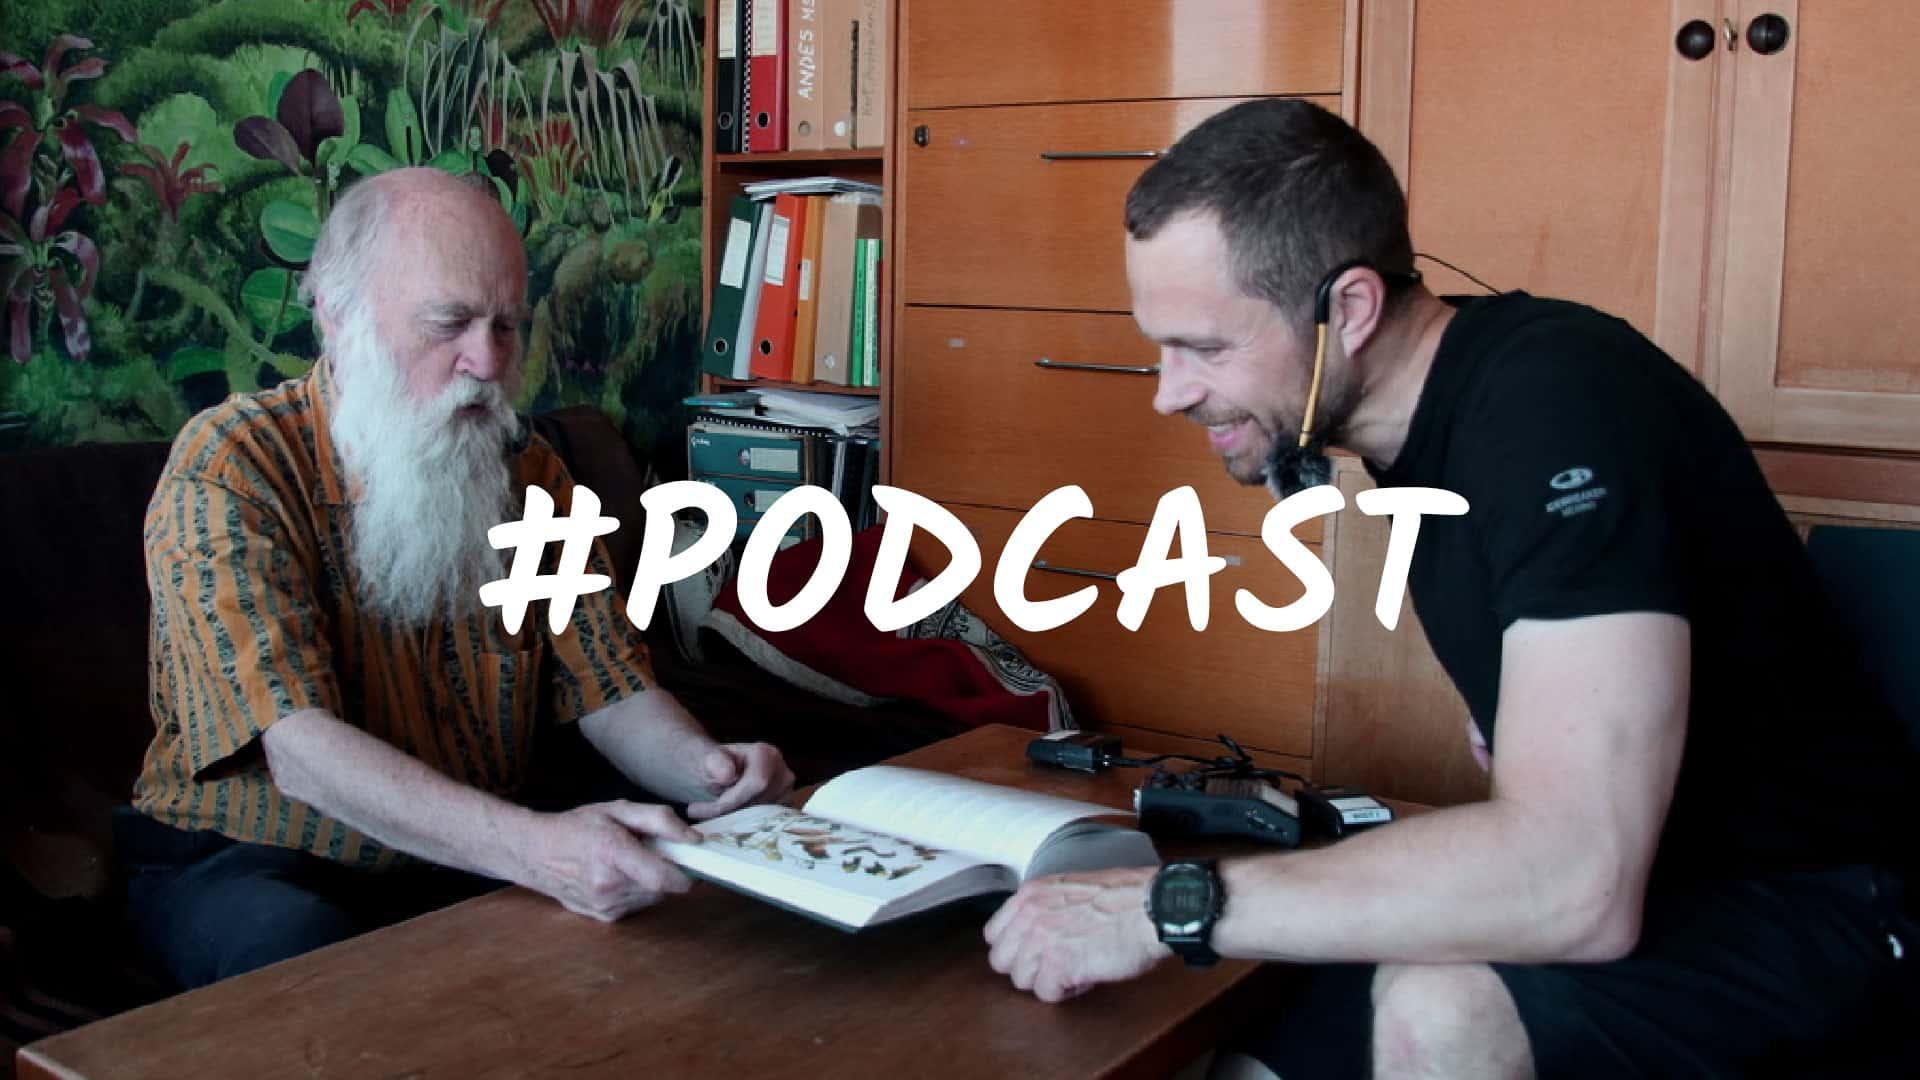 Podcast om eventyrer, rejser og livsvalg, vært Erik B. Jørgensen